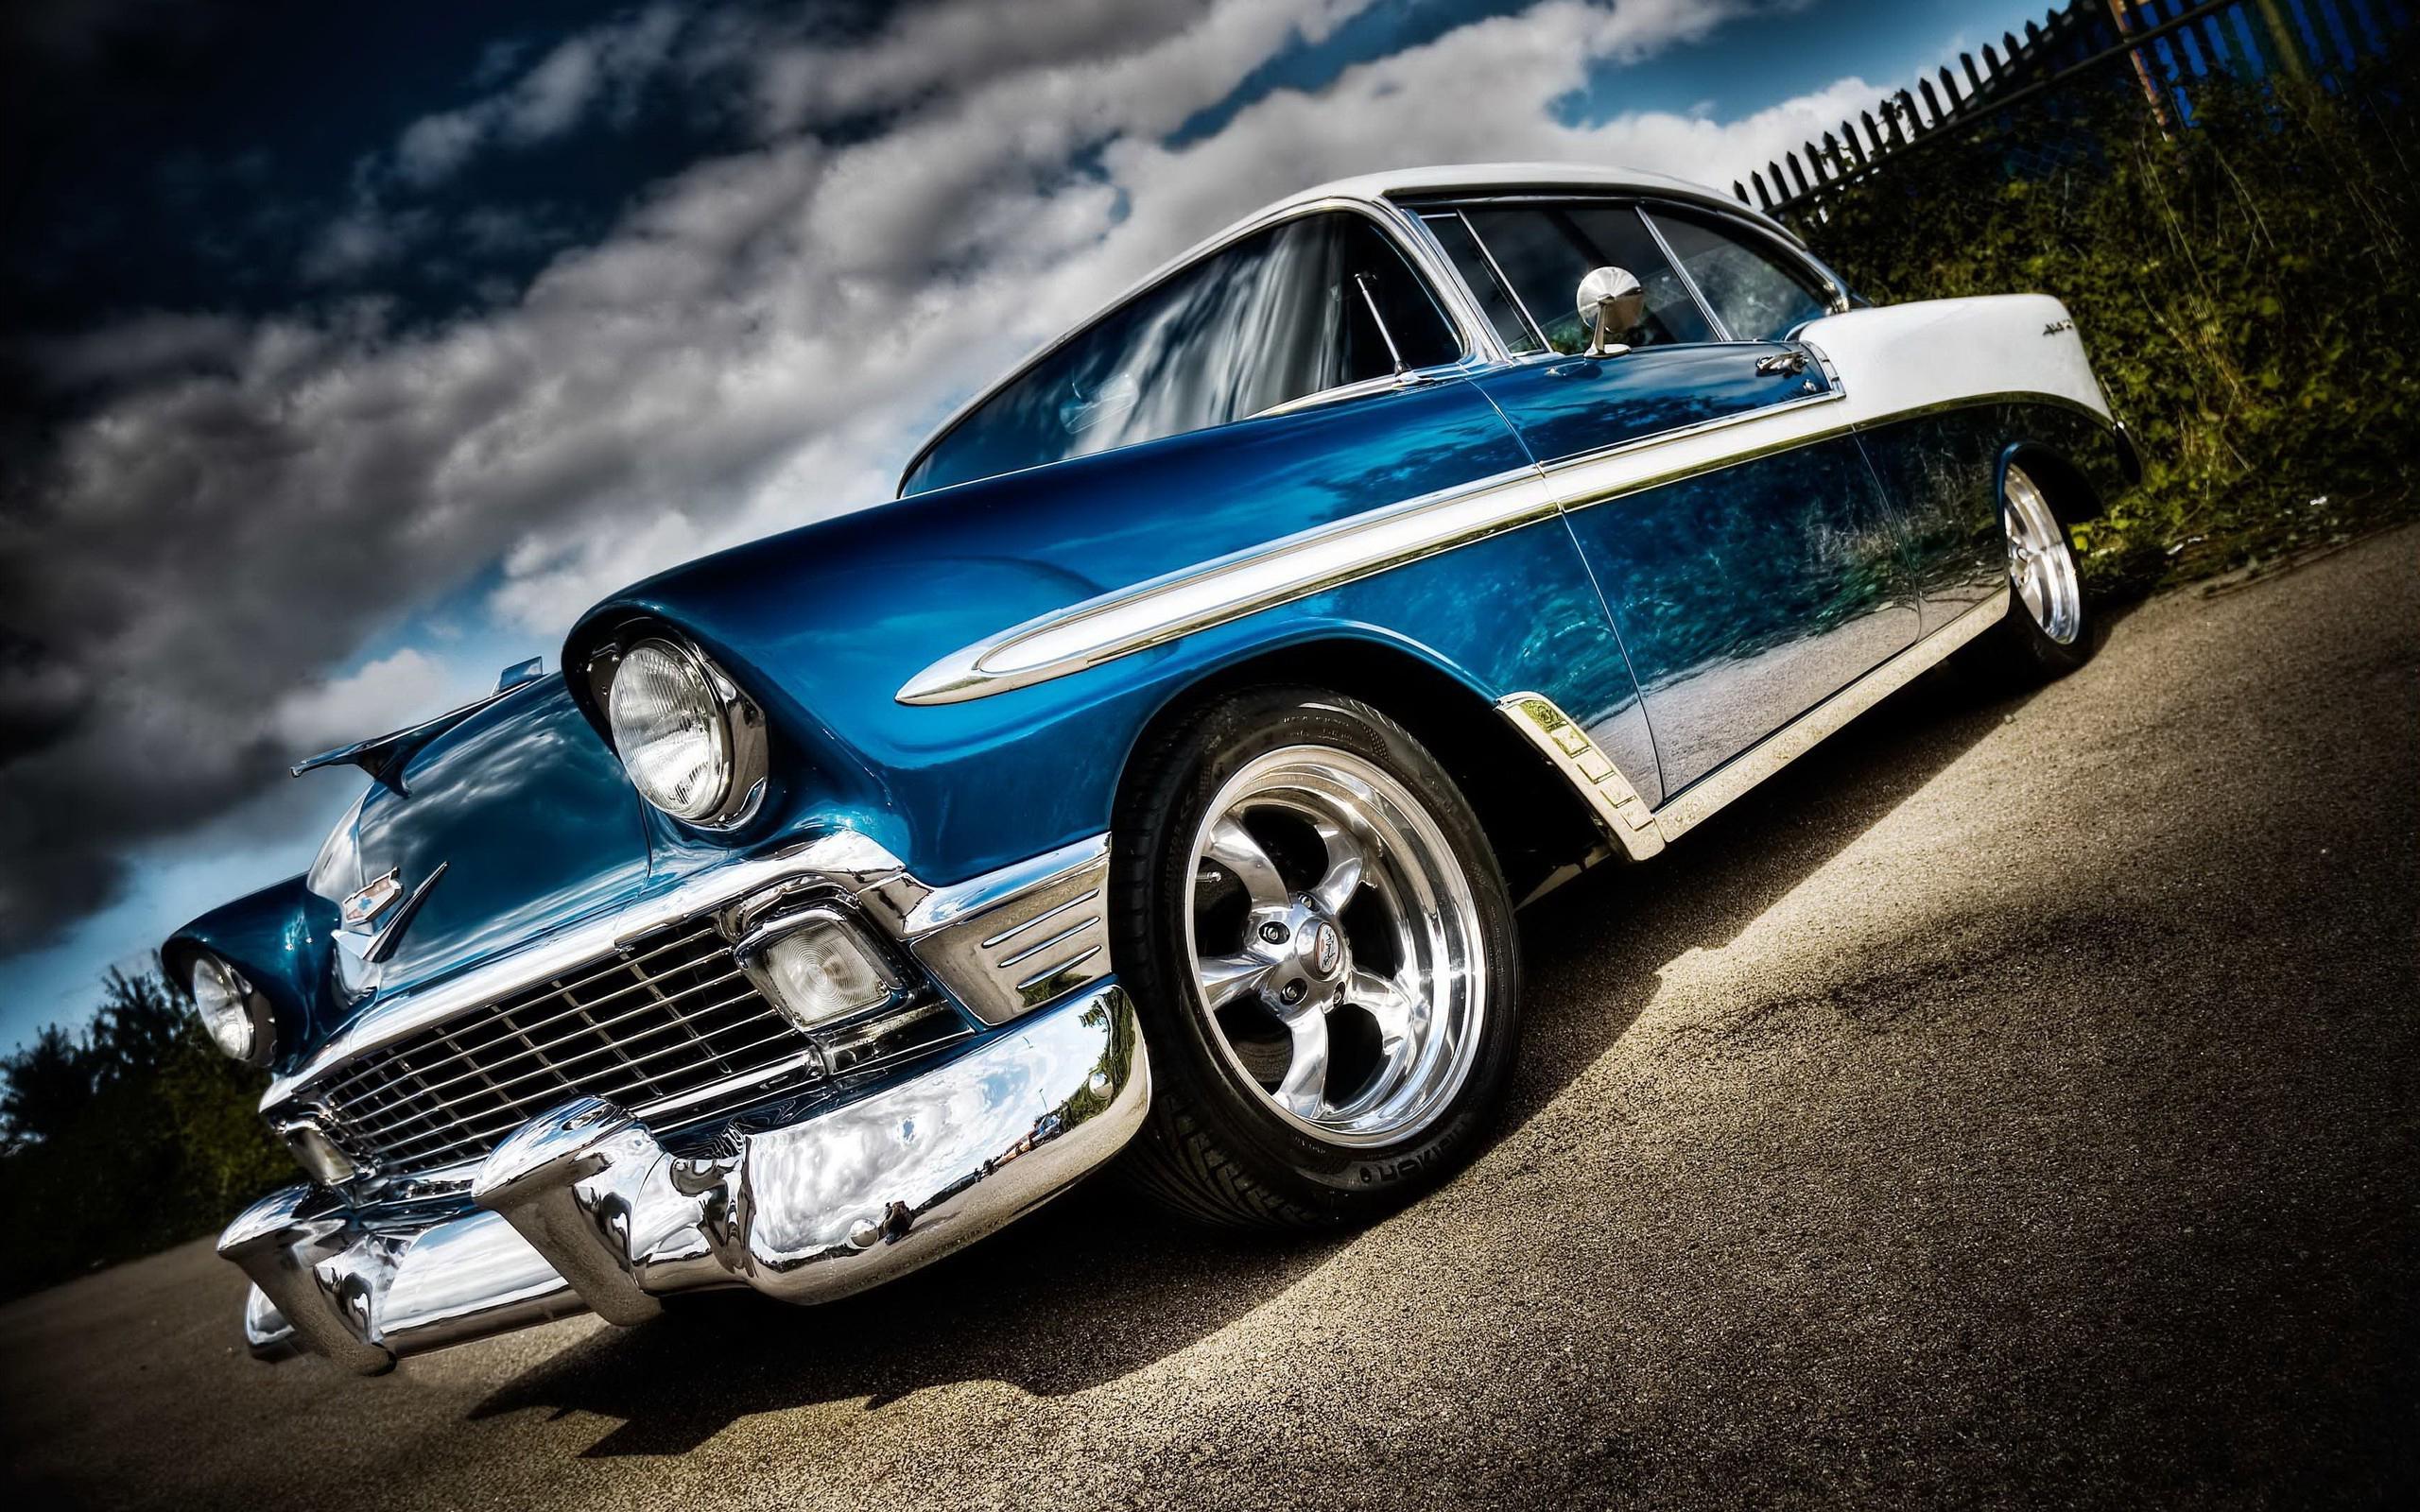 Vintage Car Desktop Wallpaper Hd Ding Machine 513 235 2095 Dent Repair Near Cincinnati Ohio